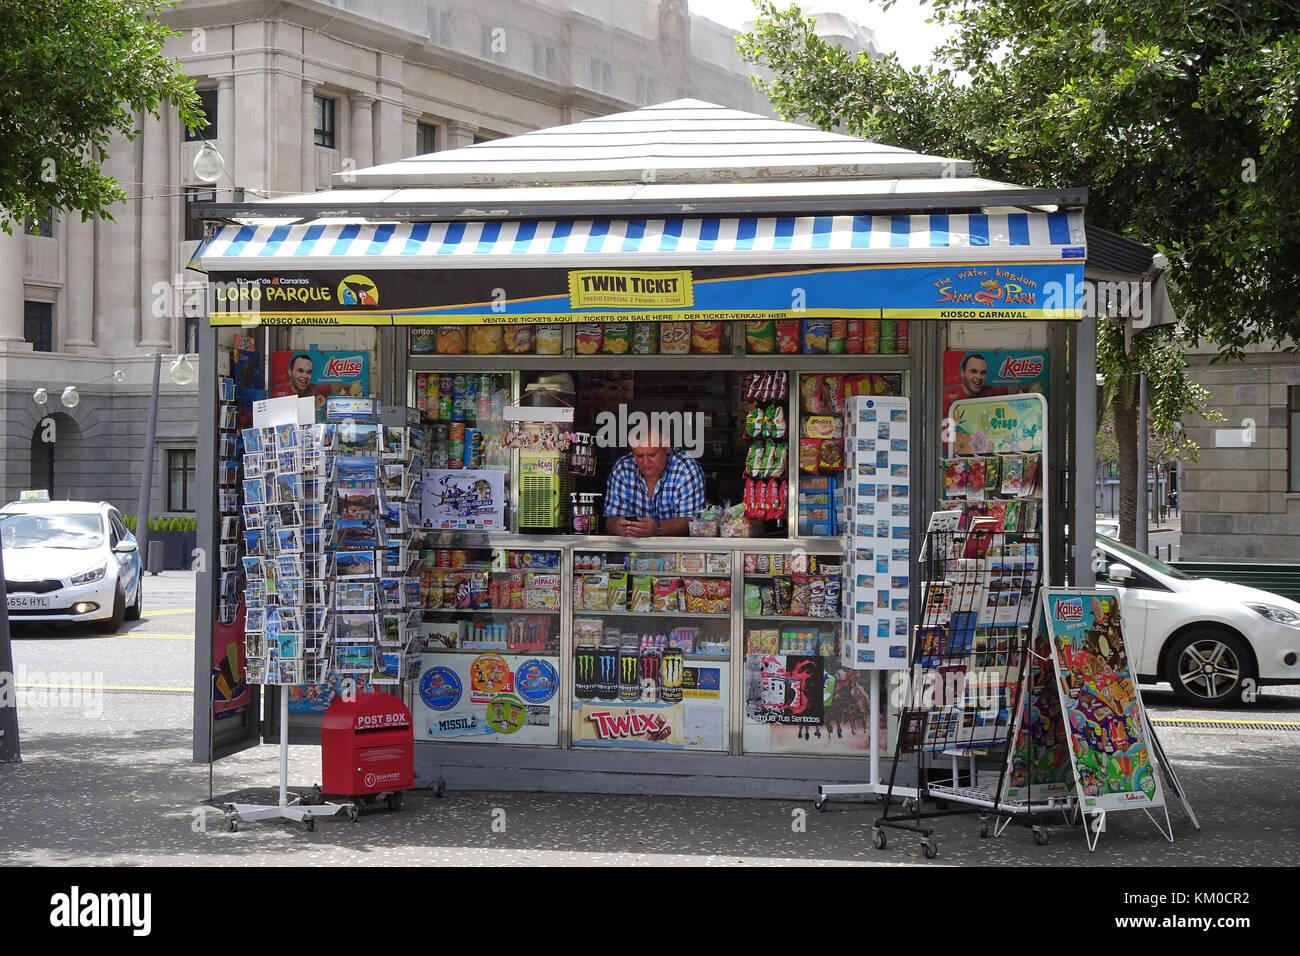 Kiosk at Place d'Espagne, Santa Cruz de Tenerife, capital of Tenerife island, Canary islands, Spain - Stock Image